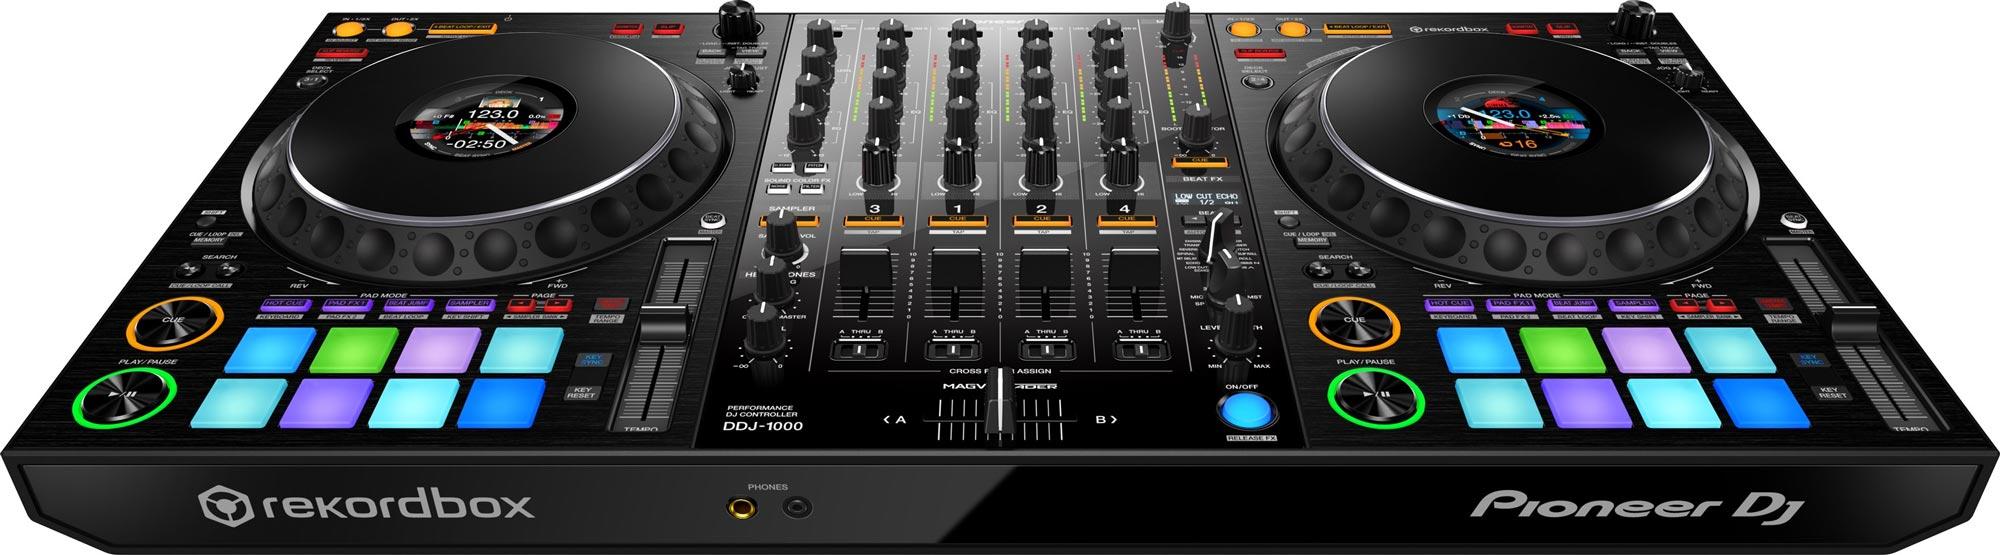 PIONEER DJ DDJ-1000 4-Channel rekordbox Controller